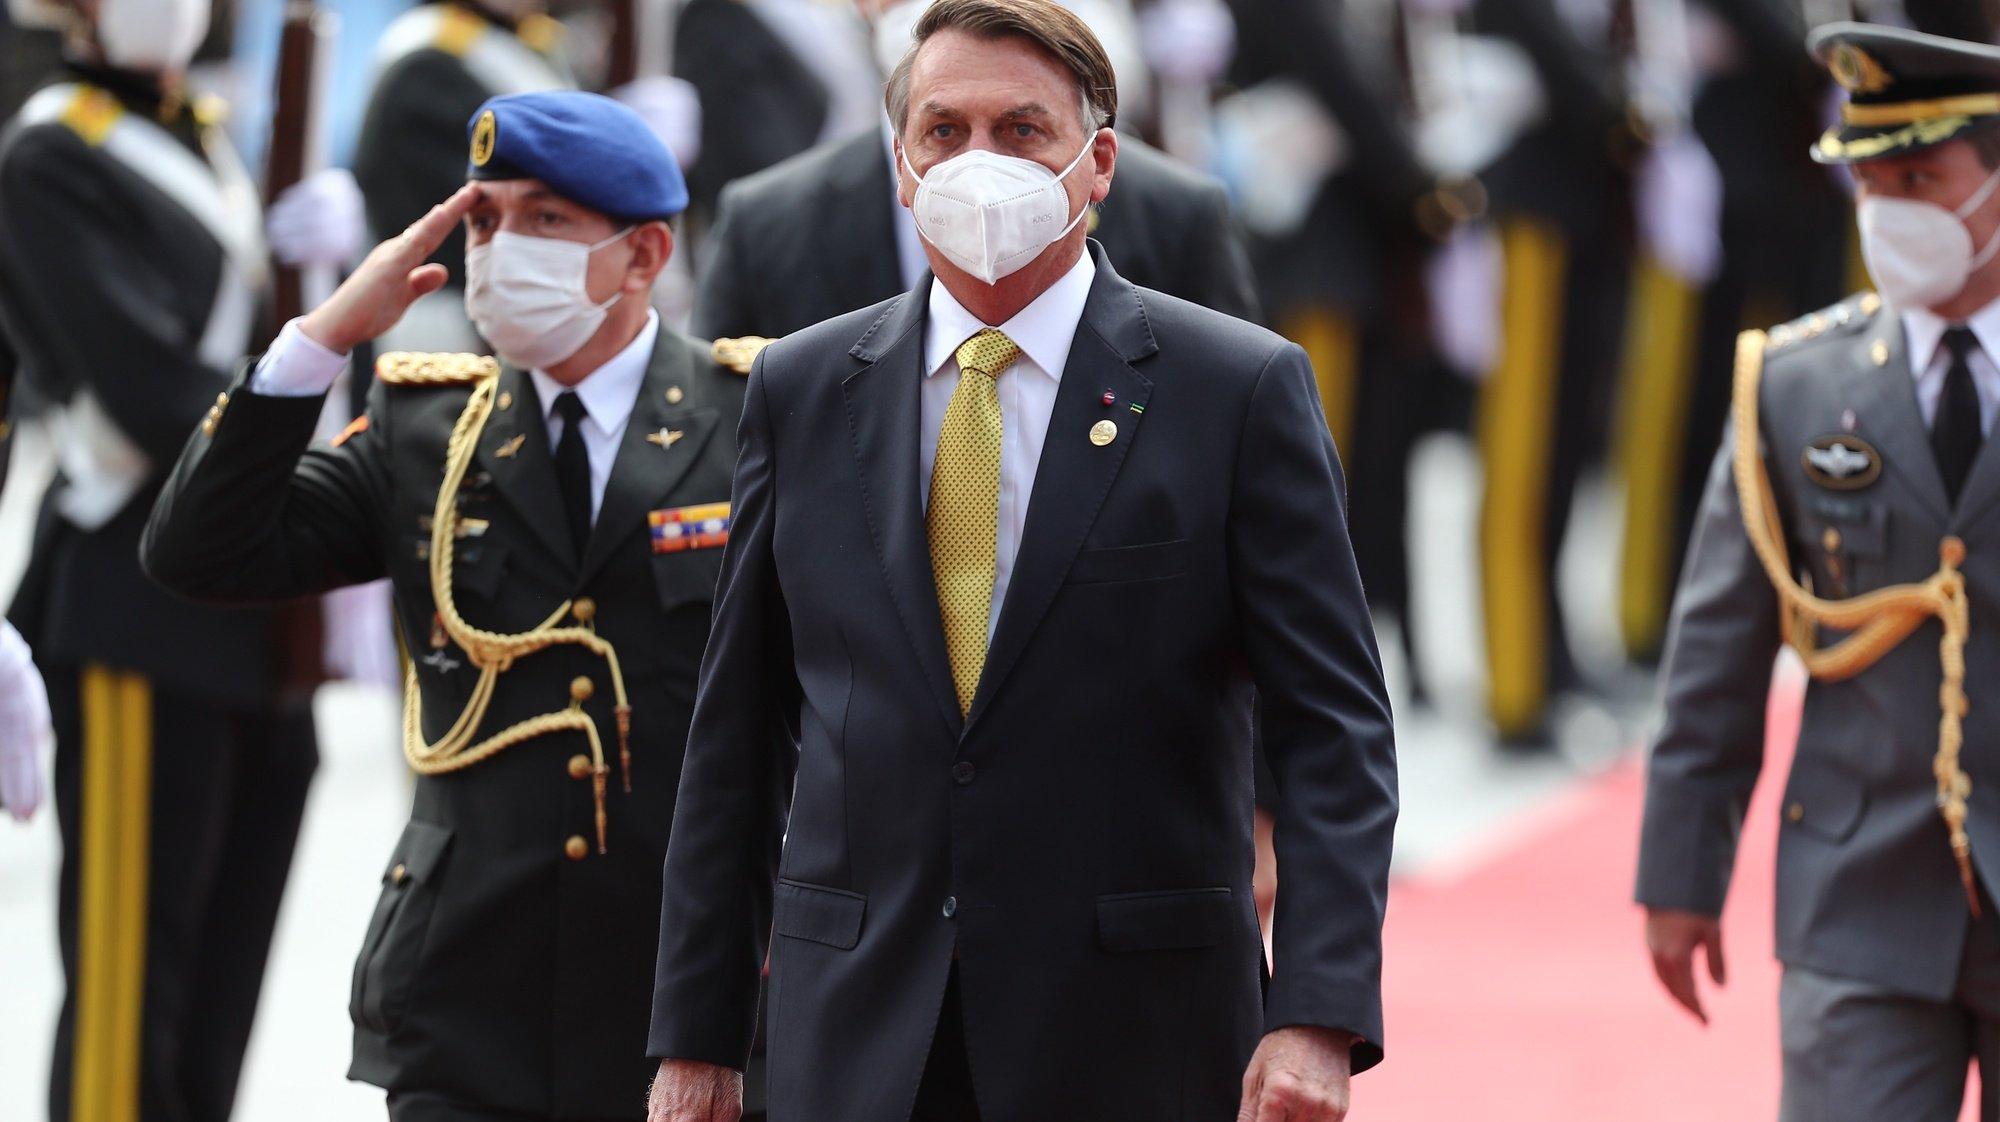 epa09225388 Brazil's President Jair Bolsonaro arrives for the inauguration ceremony of Ecuador's President-elect Lasso in Quito, Ecuador, 24 May 2021.  EPA/Jose Jacome